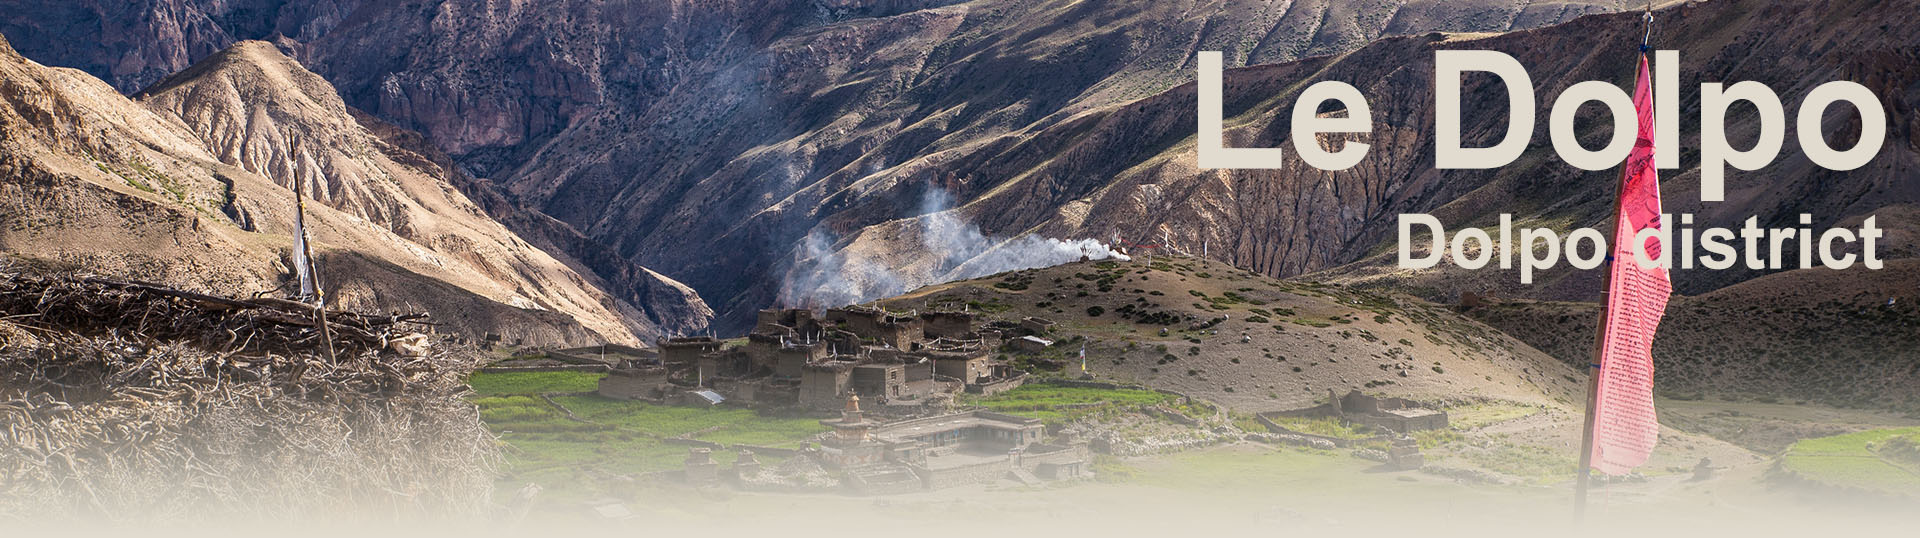 Voyage au Népal - Dolpo trek